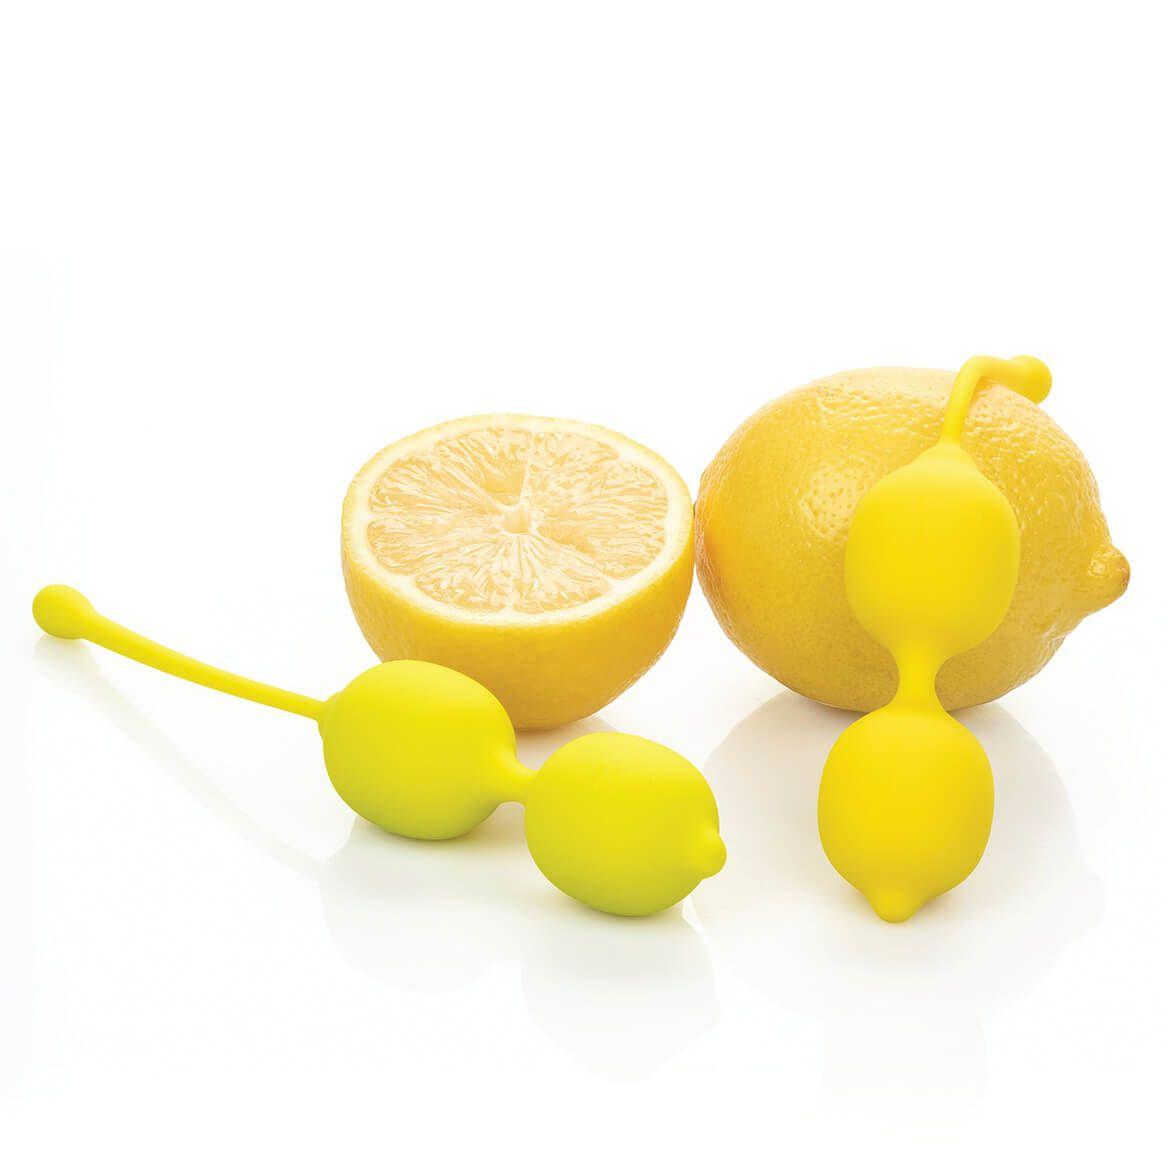 Lemon Variably Weighted Dual Kegel Training Balls, Set of 2-369678